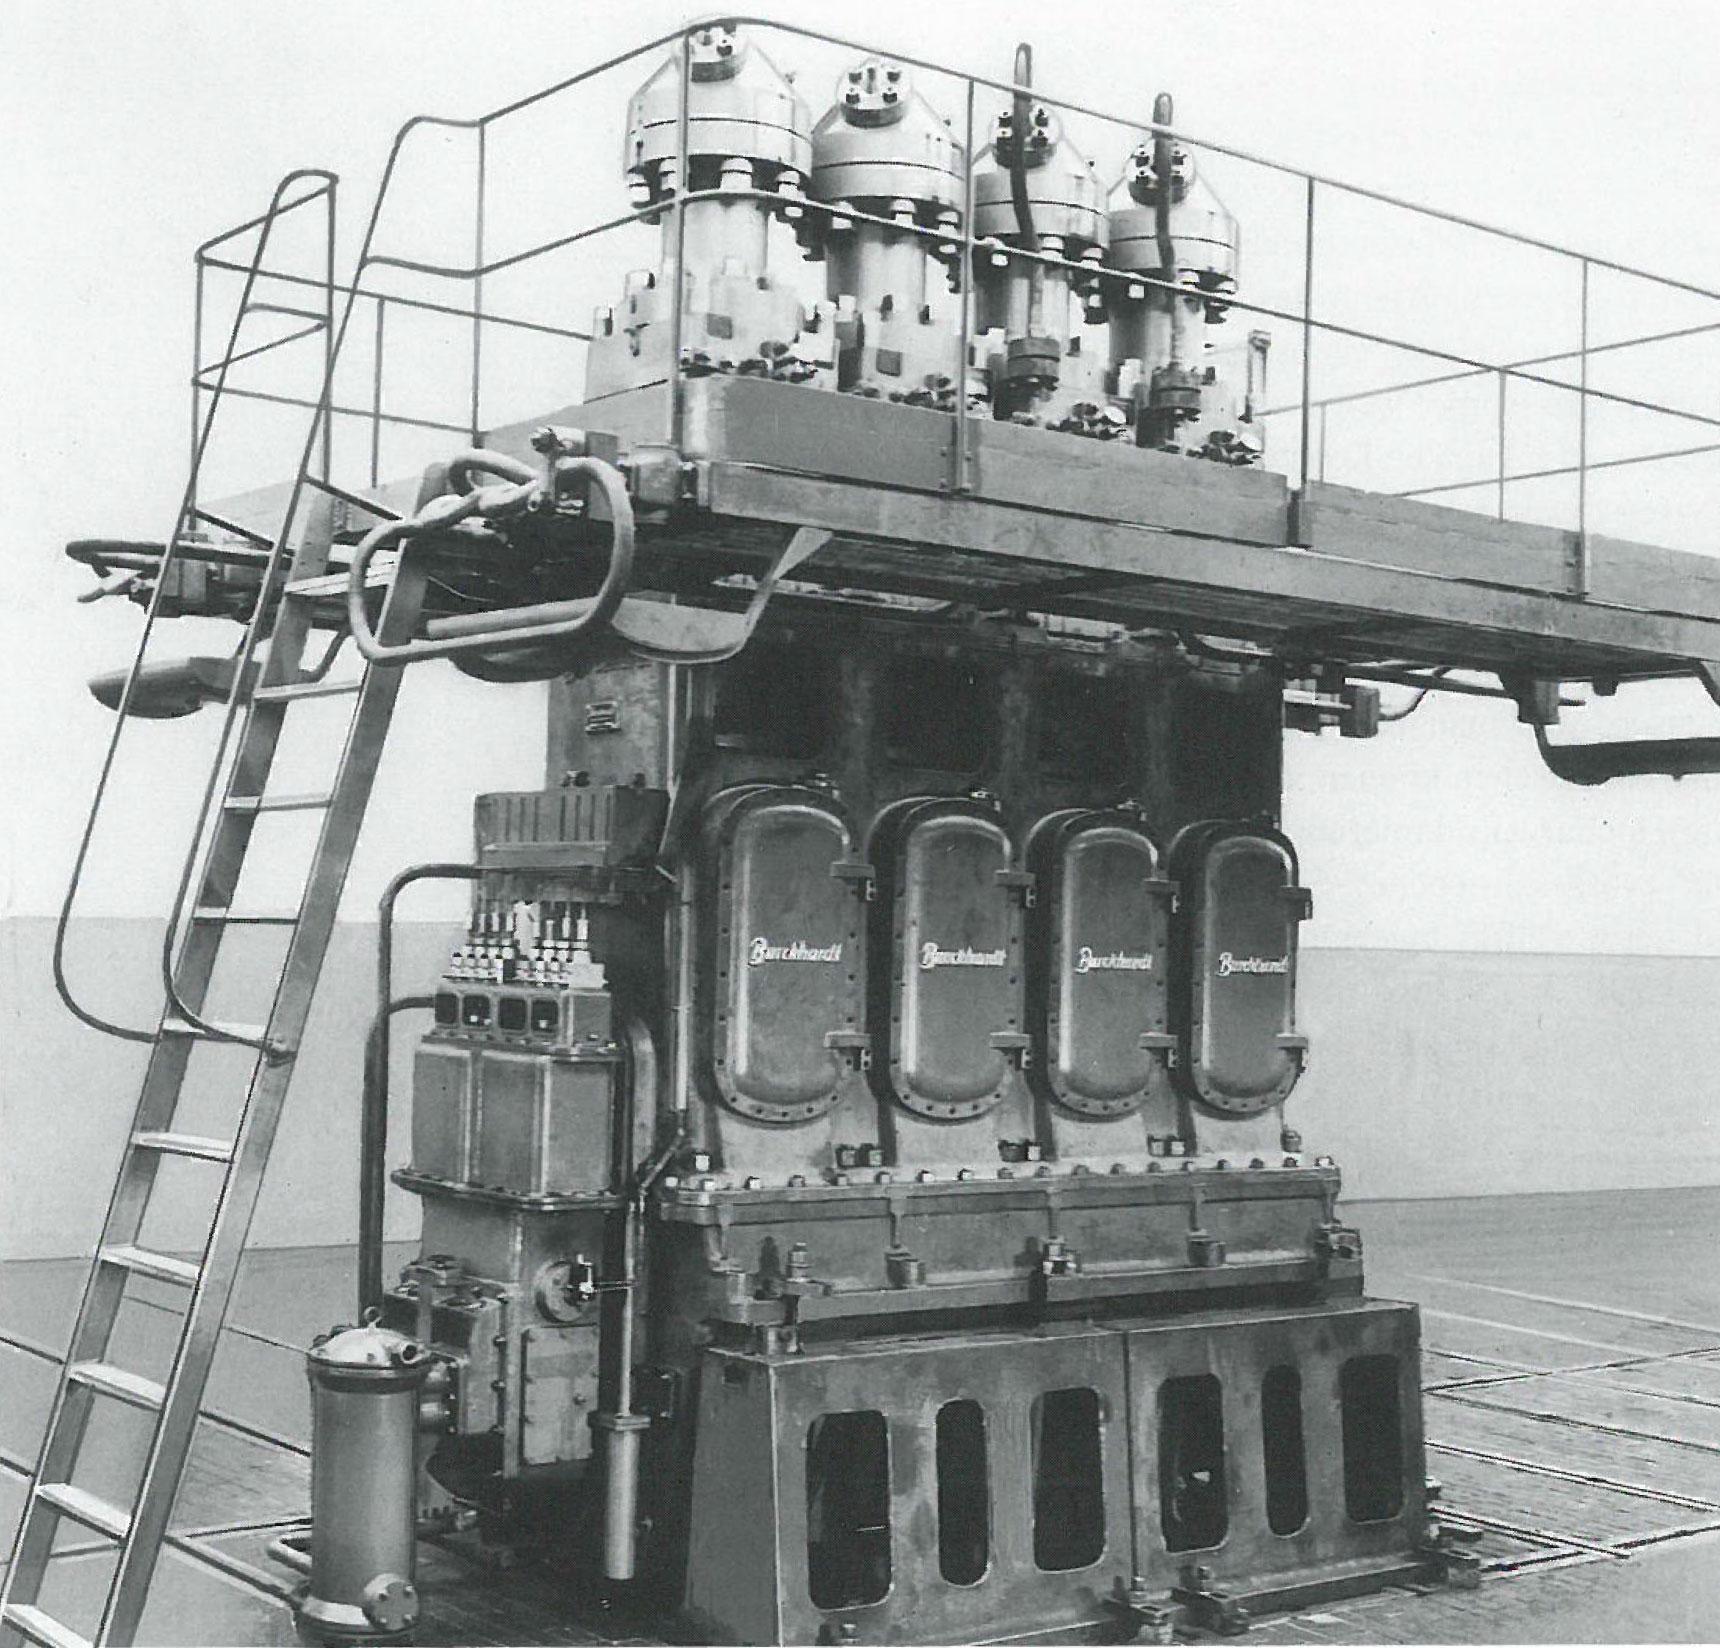 1951 - huge order intake